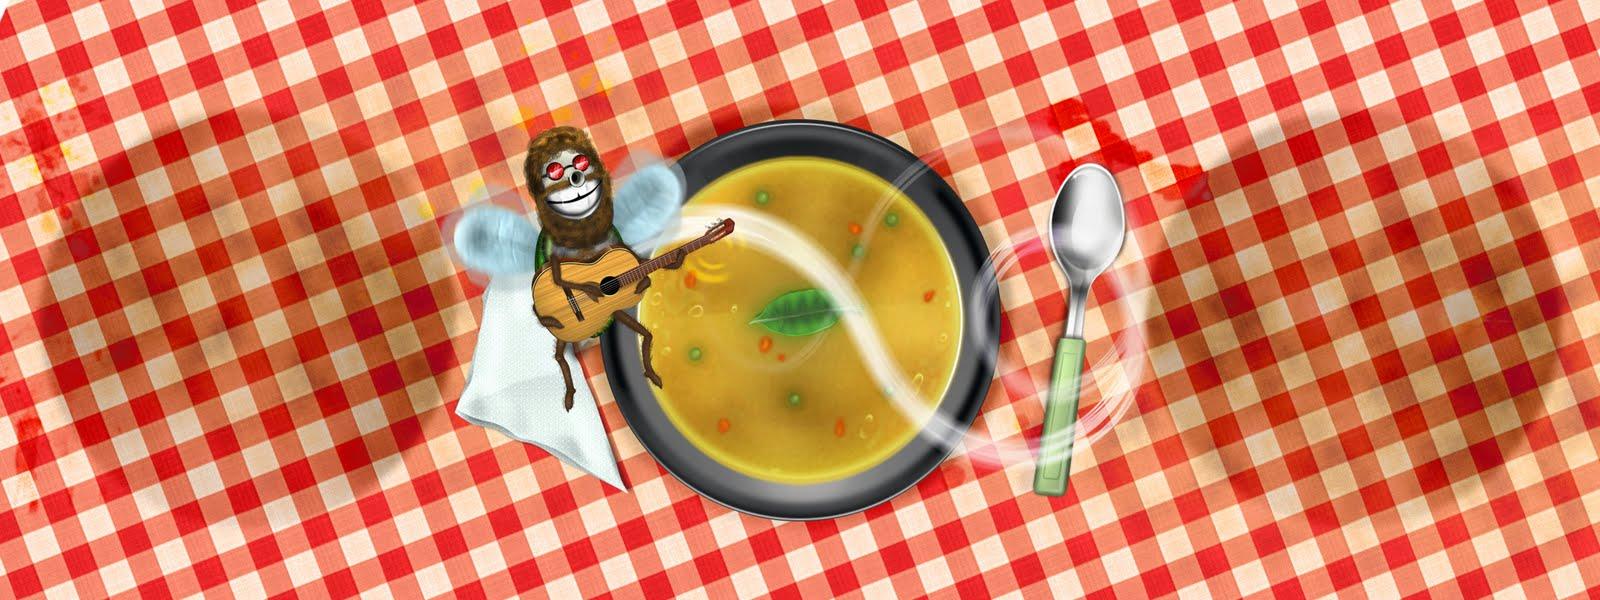 Mosca na sopa (DJ Vivi Seixas Remix) - YouTube